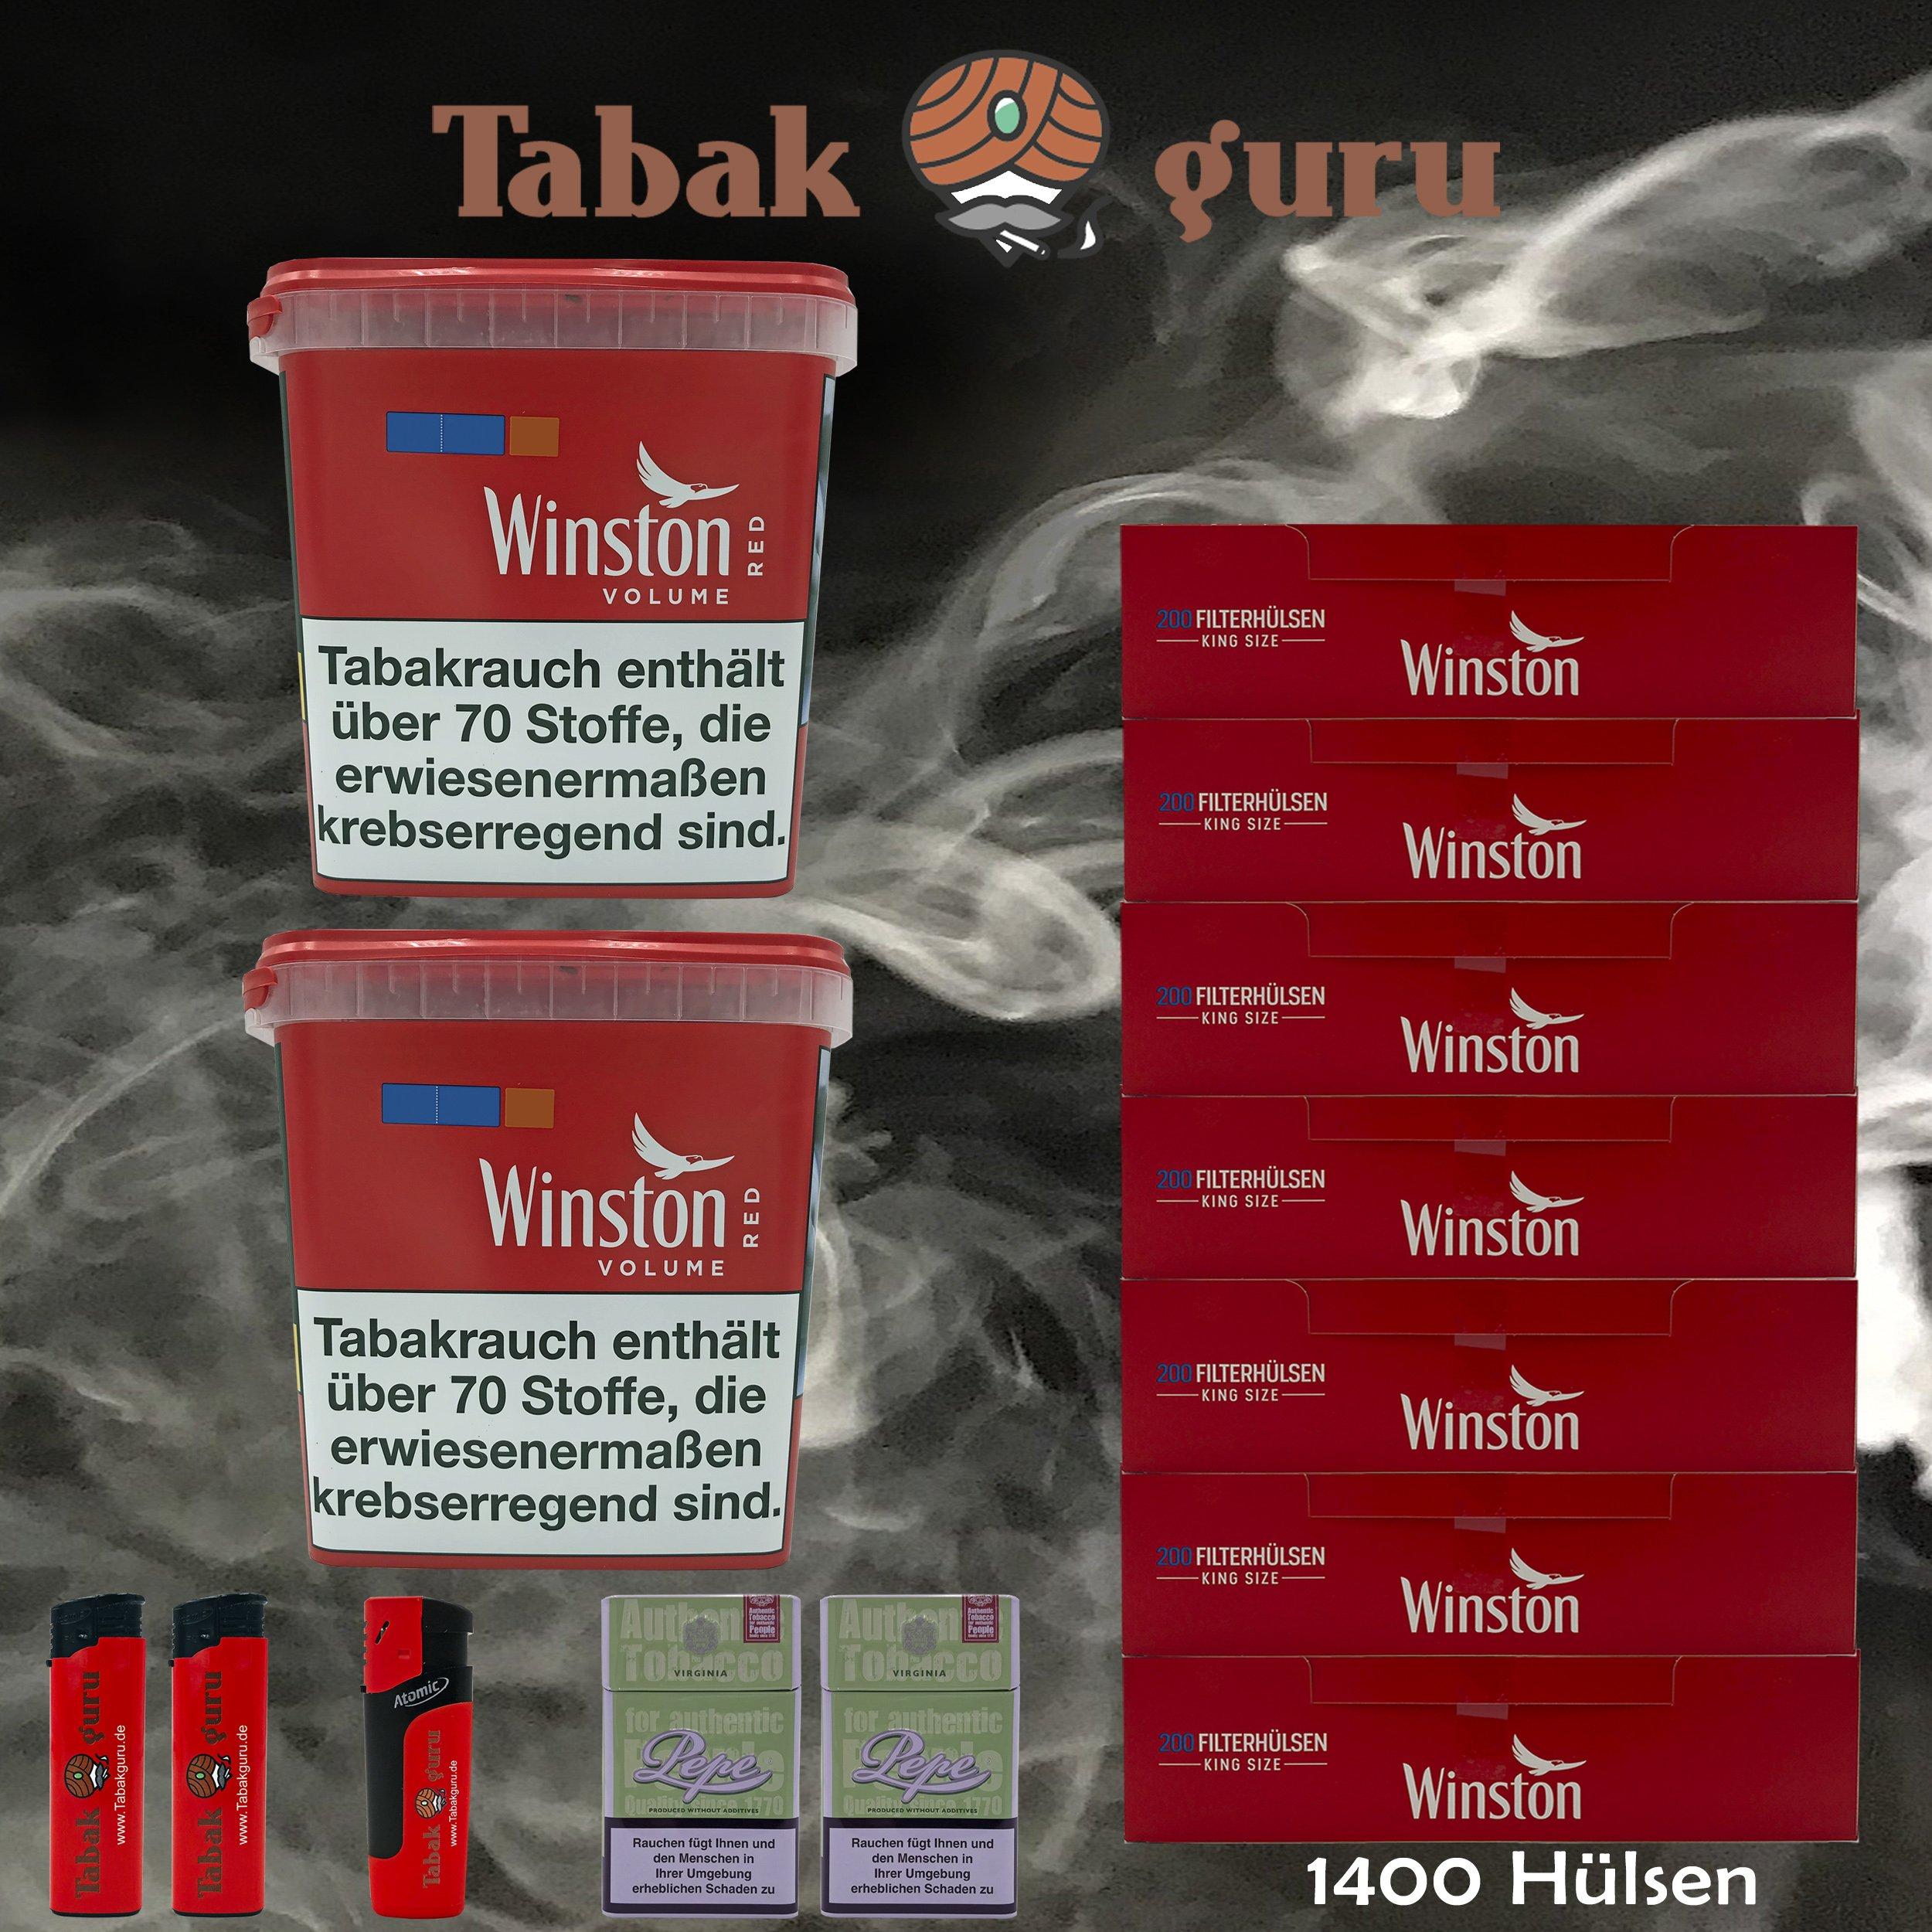 2x Winston Classic Red/Rot Giant Box 280g Volumentabak, 1400 Hülsen, Zubehör